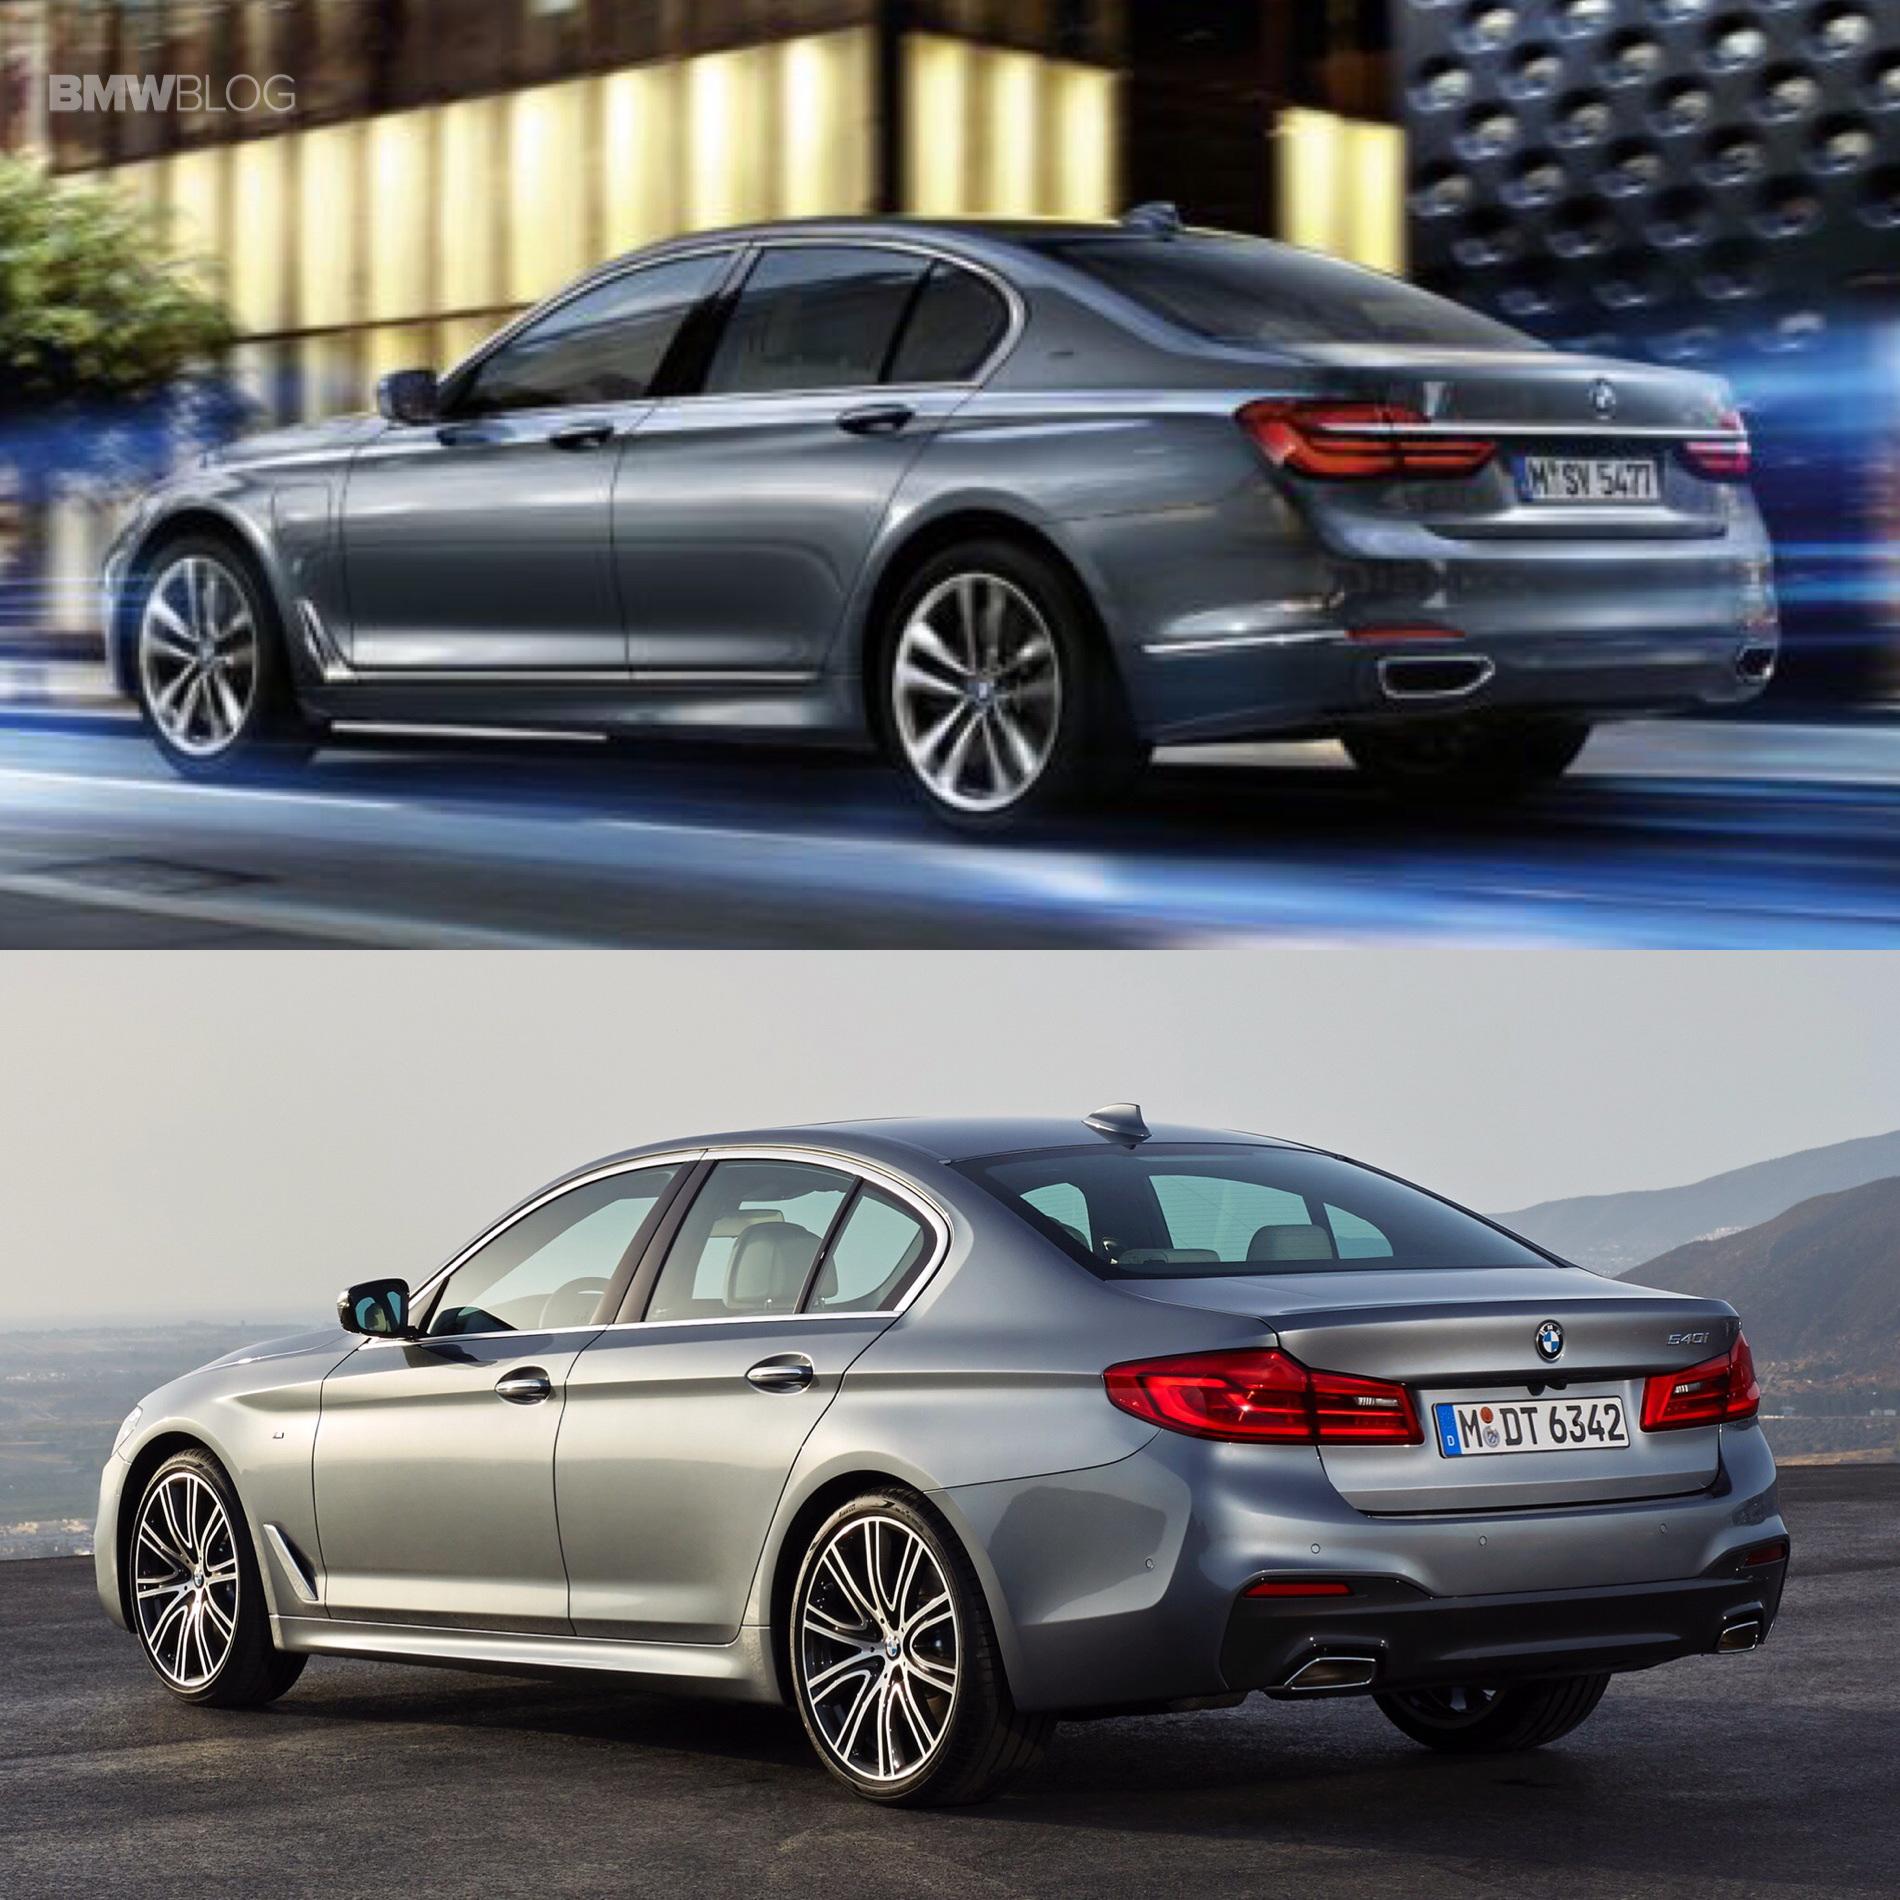 Bmw Connected Drive >> 2017 BMW G30 5 Series vs. BMW G11 7 Series - Photo Comparison